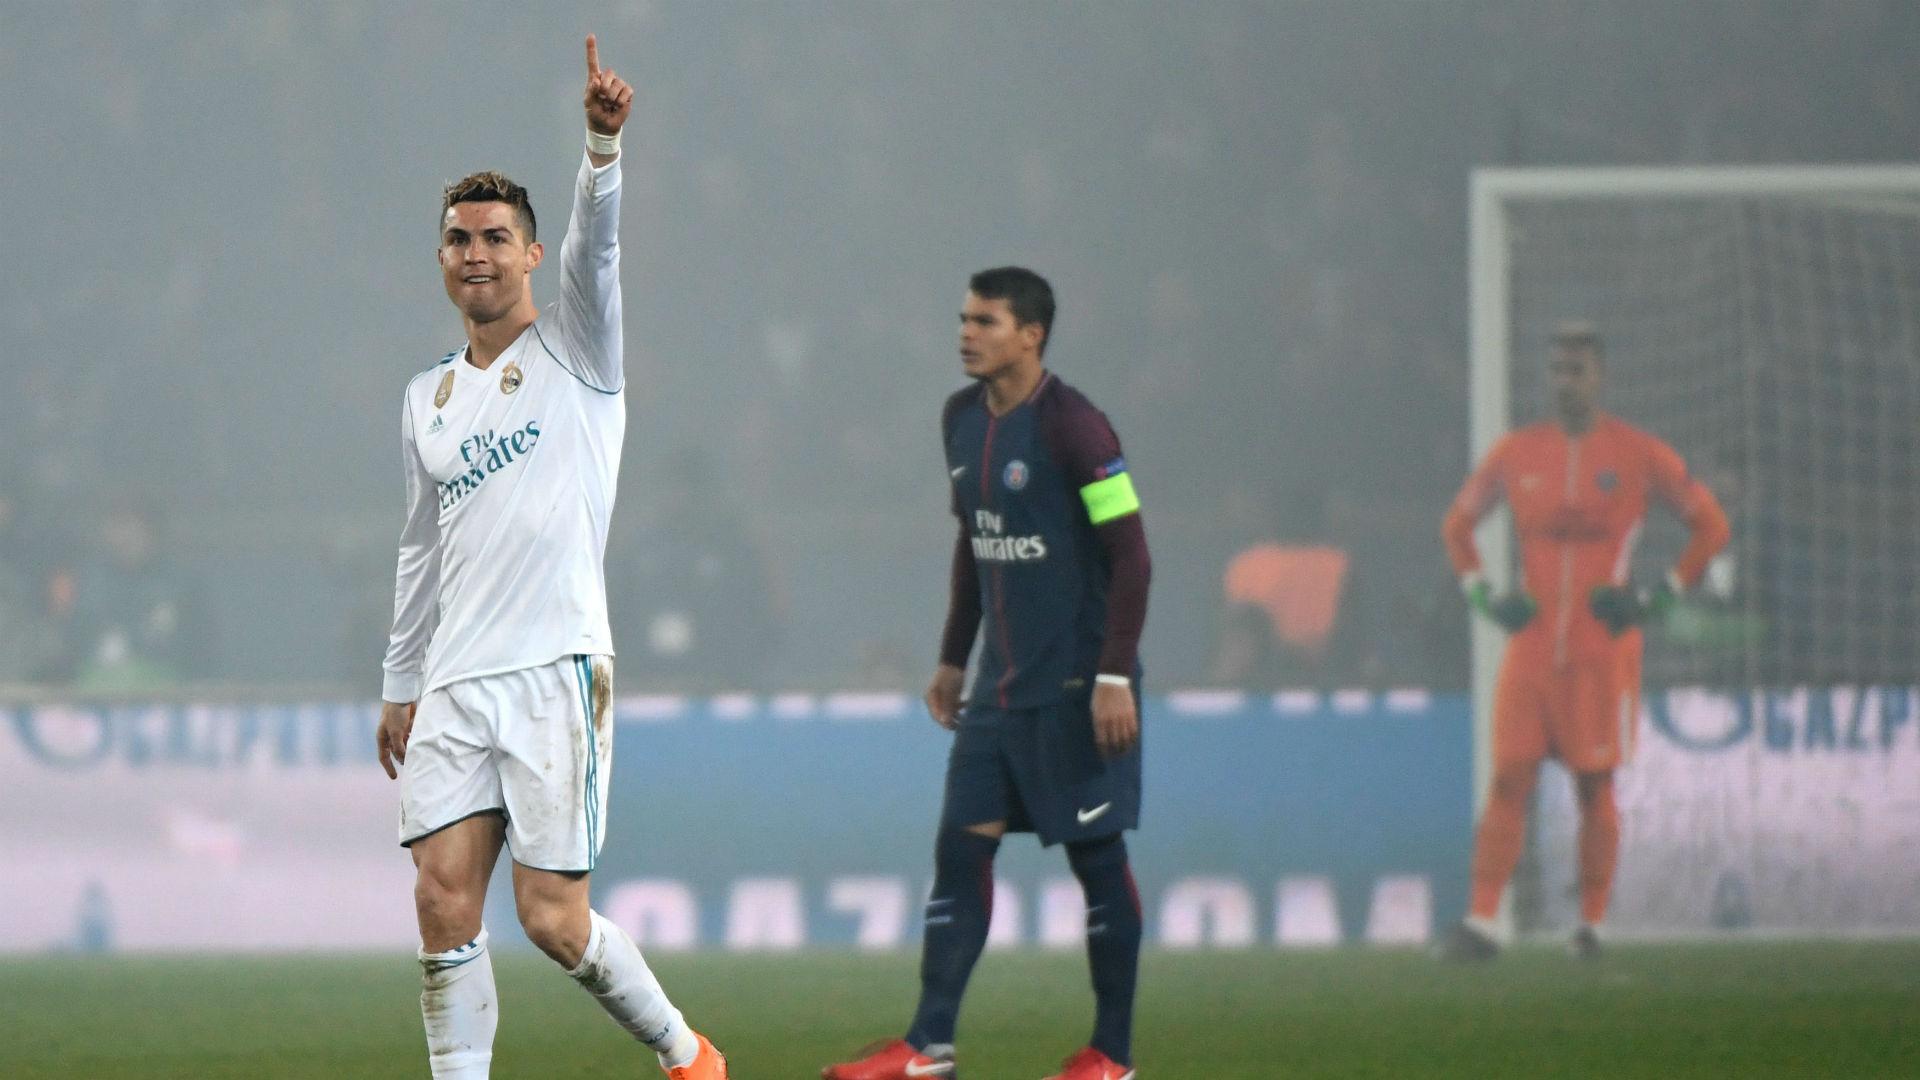 Cristiano Ronaldo PSG Real Madrid Champions League 06032018.jpg